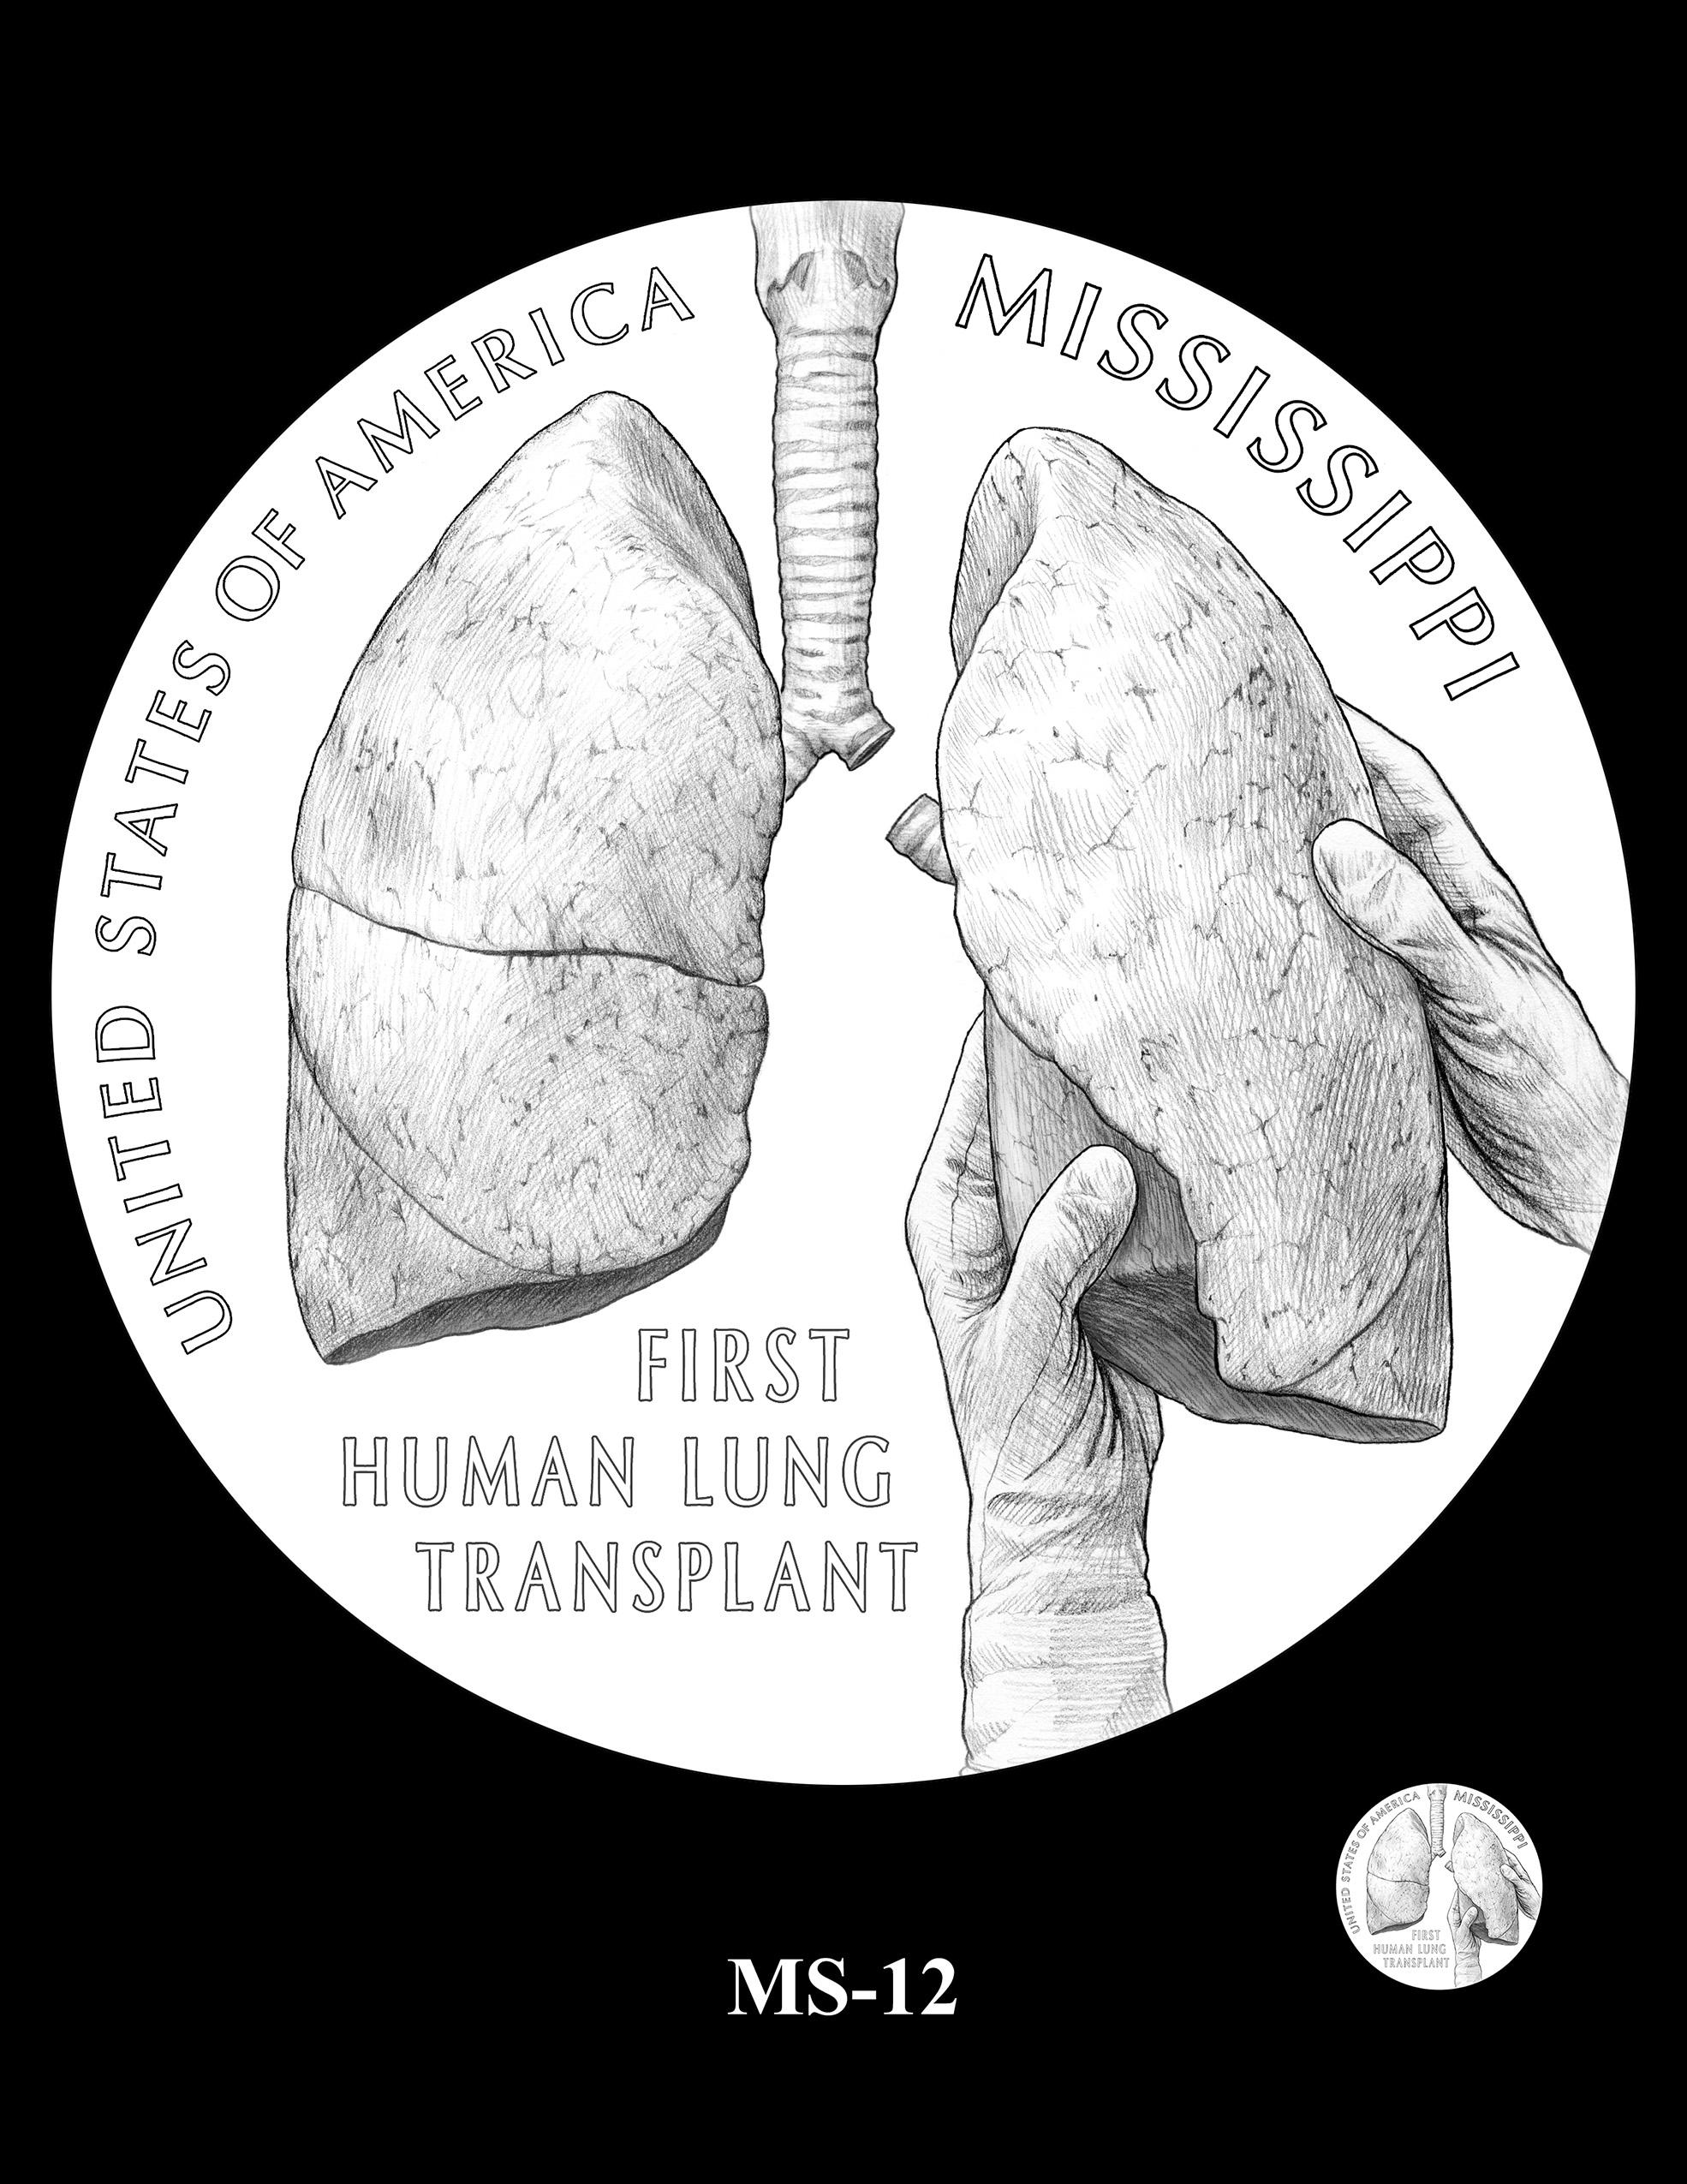 MS-12 -- 2023 American Innovation $1 Coin Program - Mississippi